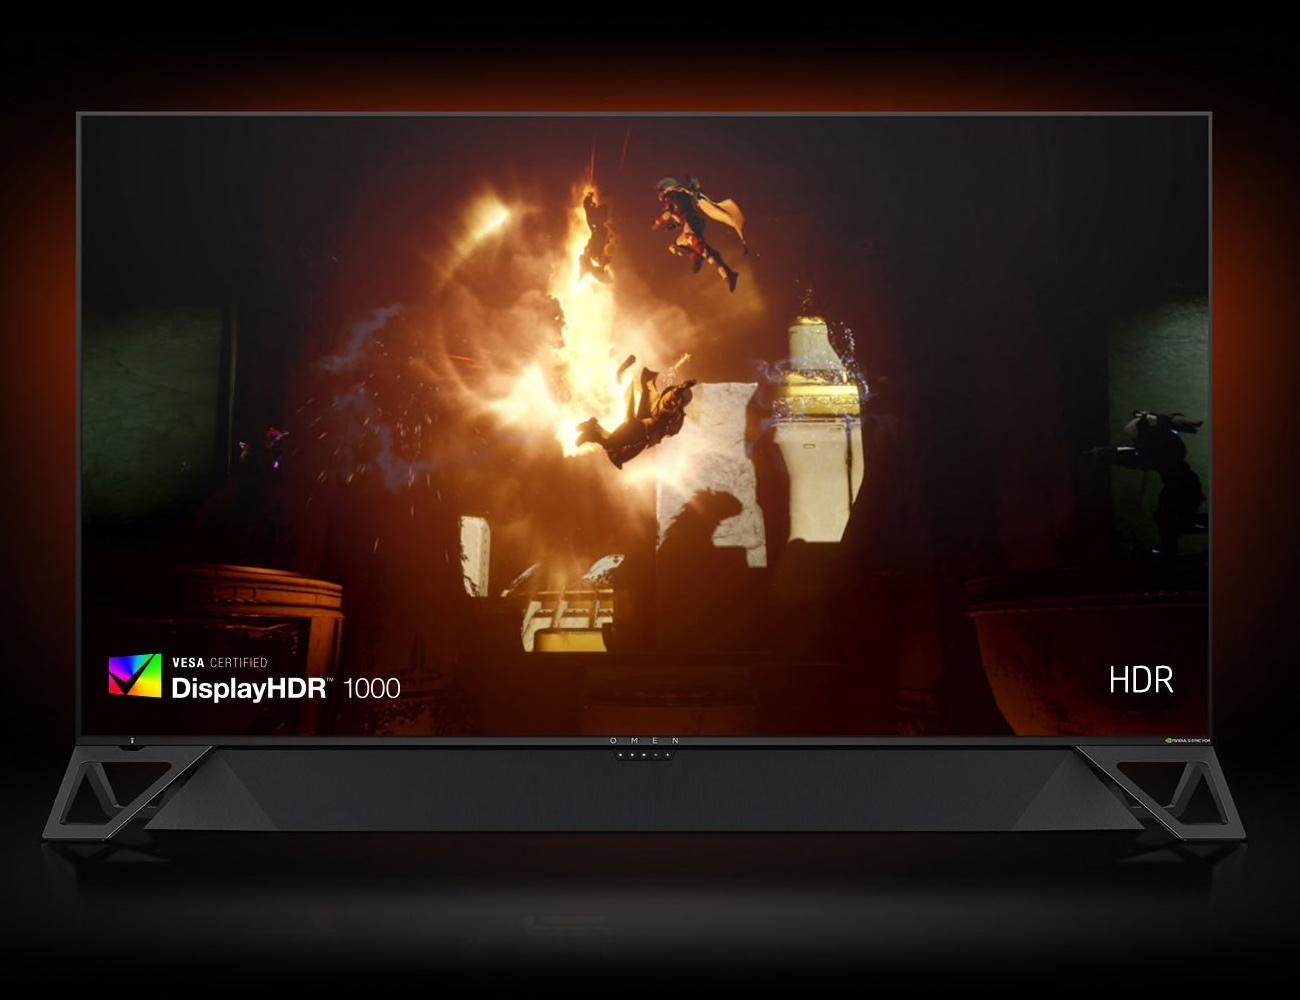 HP OMEN X Emperium 65 Gaming Monitor